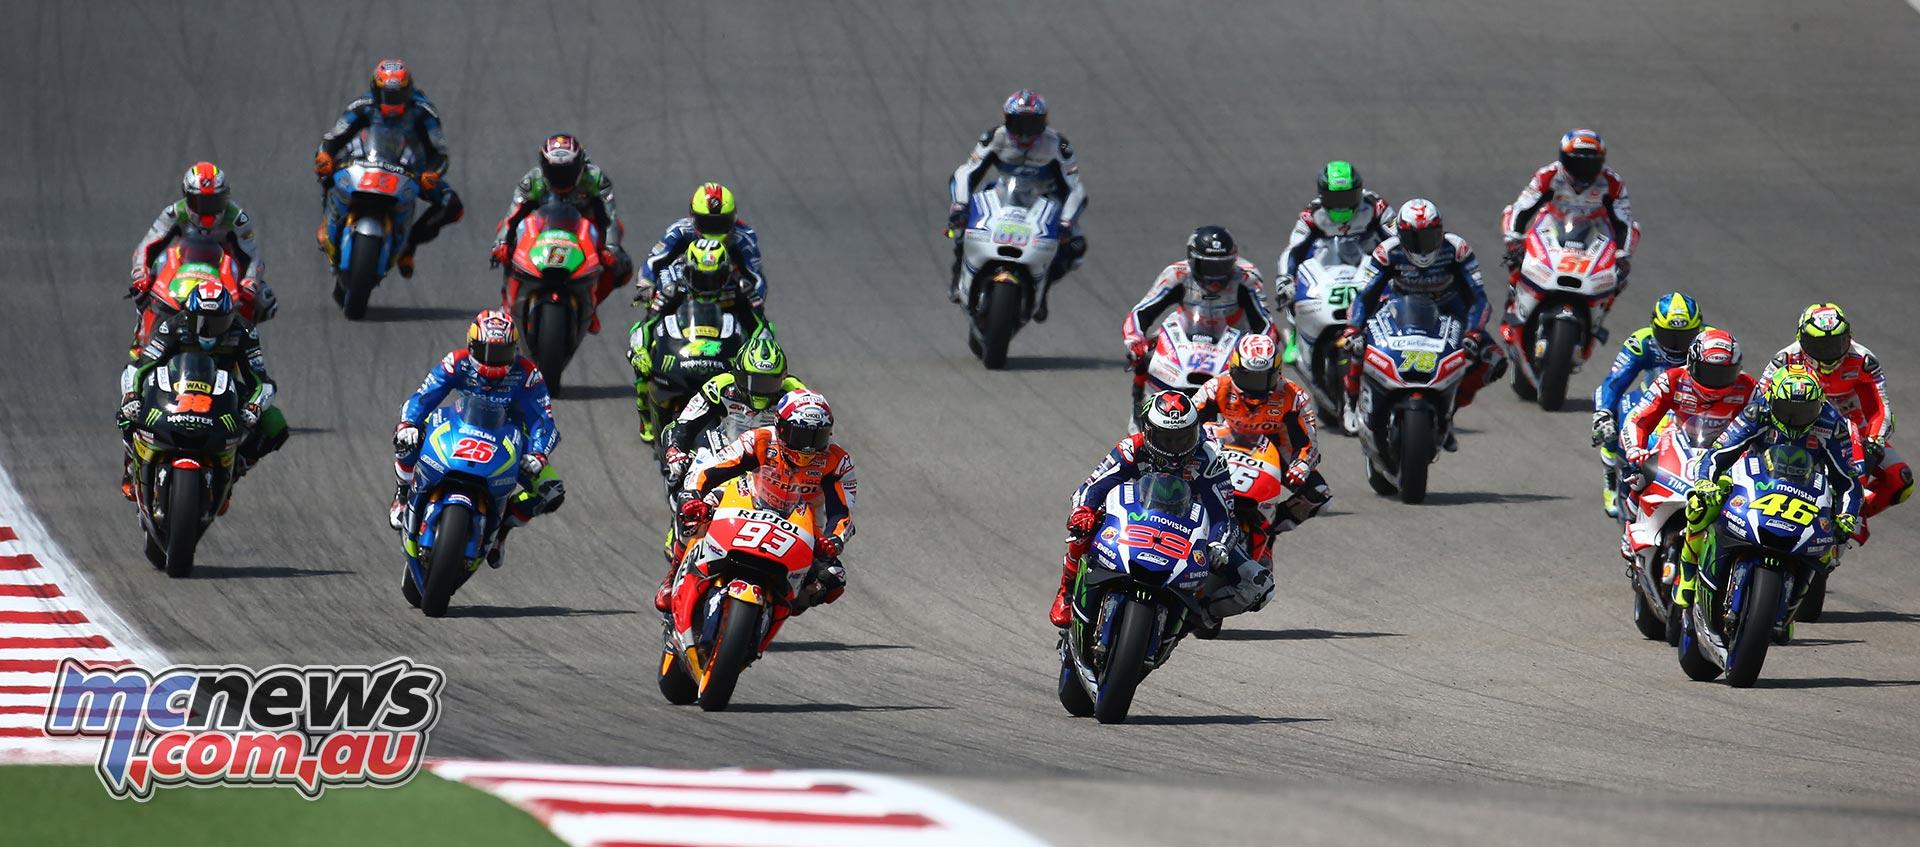 MotoGP 2016 - Circuit of Americas, Austin Texas